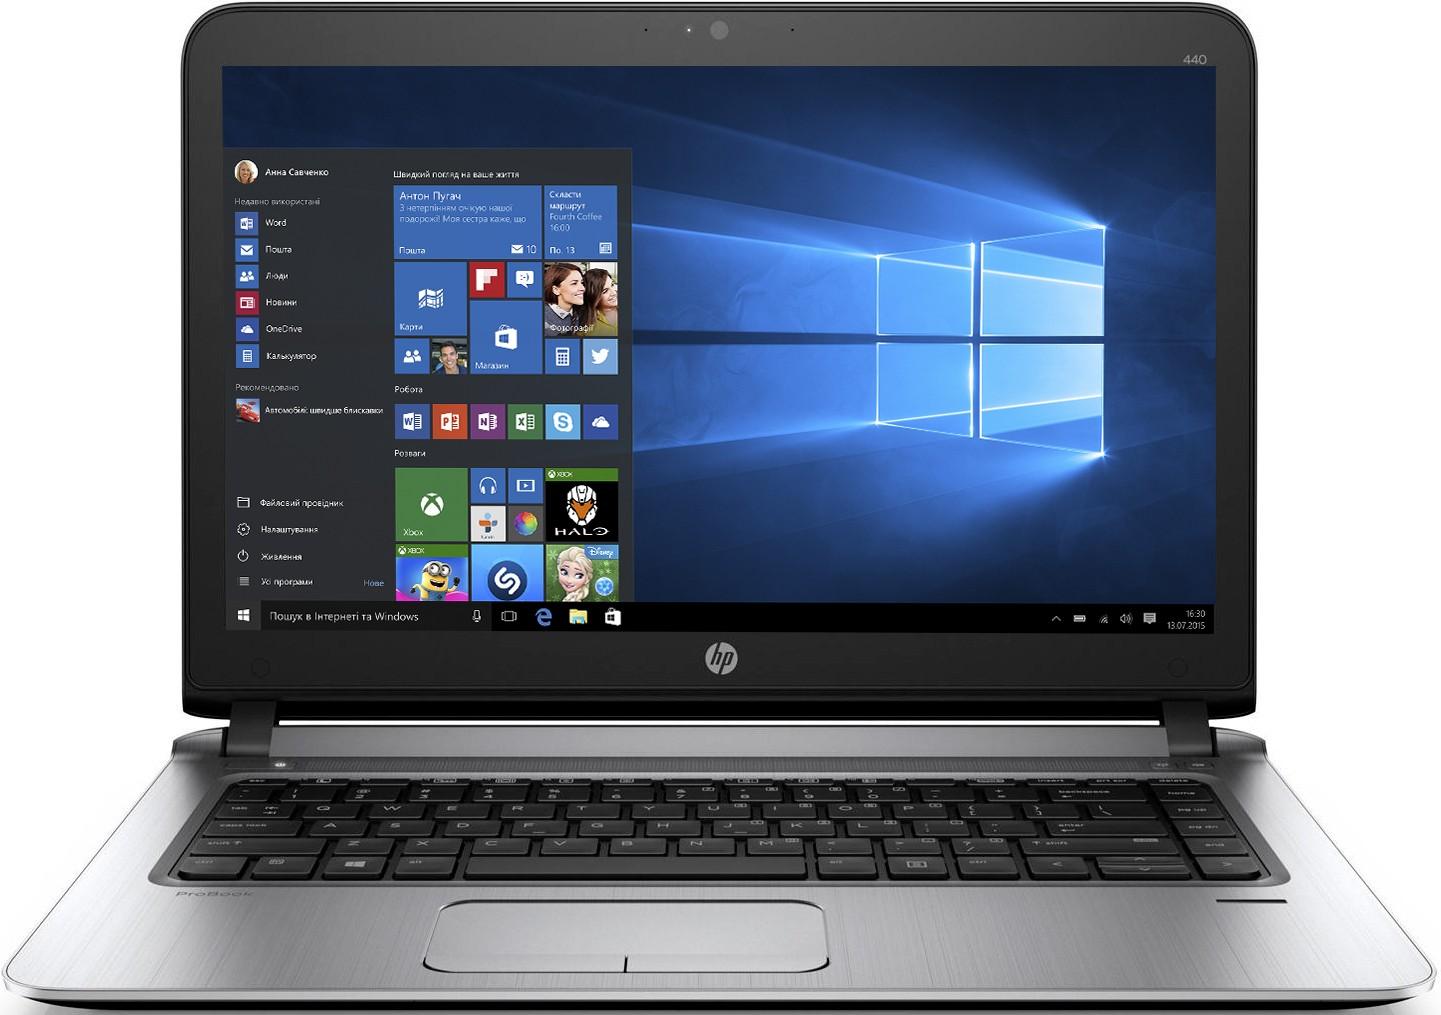 HP Probook 440 G3 (W4P04EA)